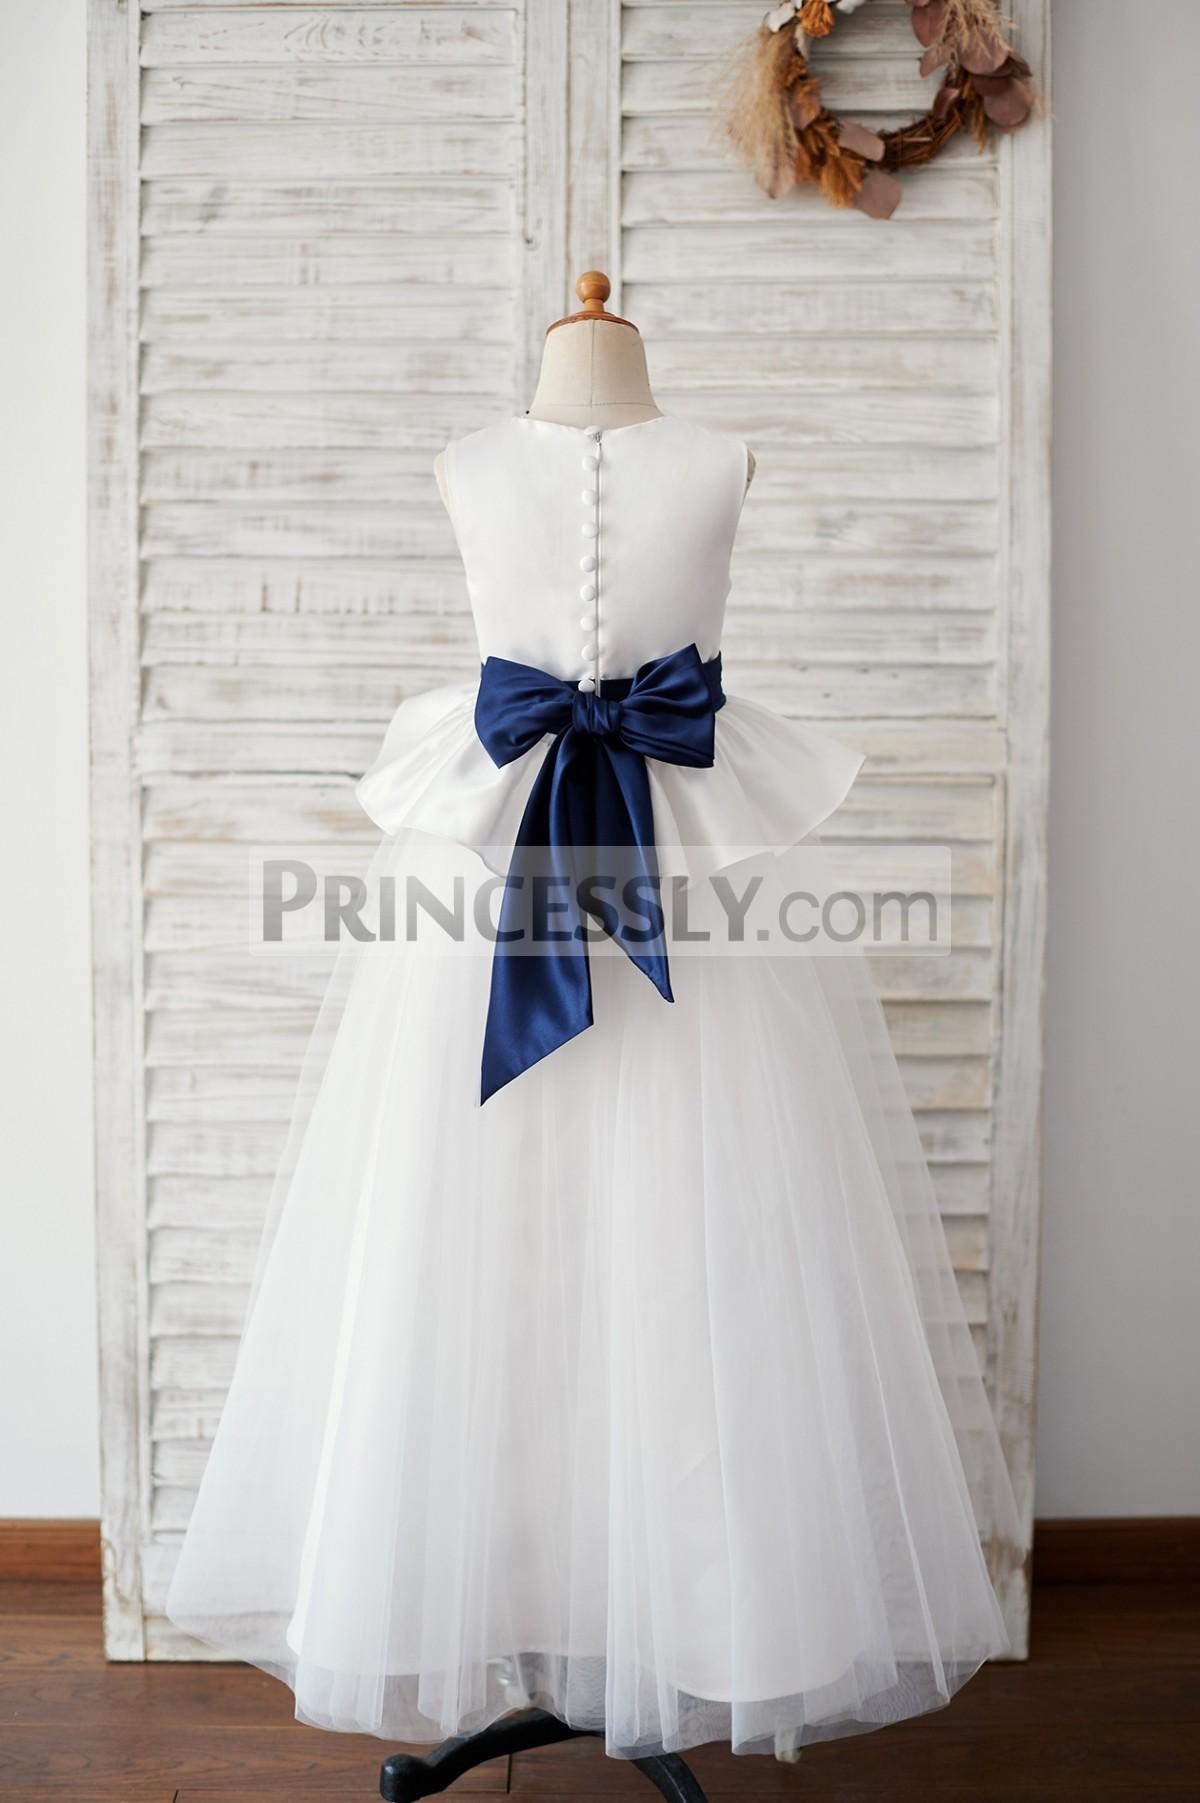 Satin tulle ivory long wedding baby girl dress